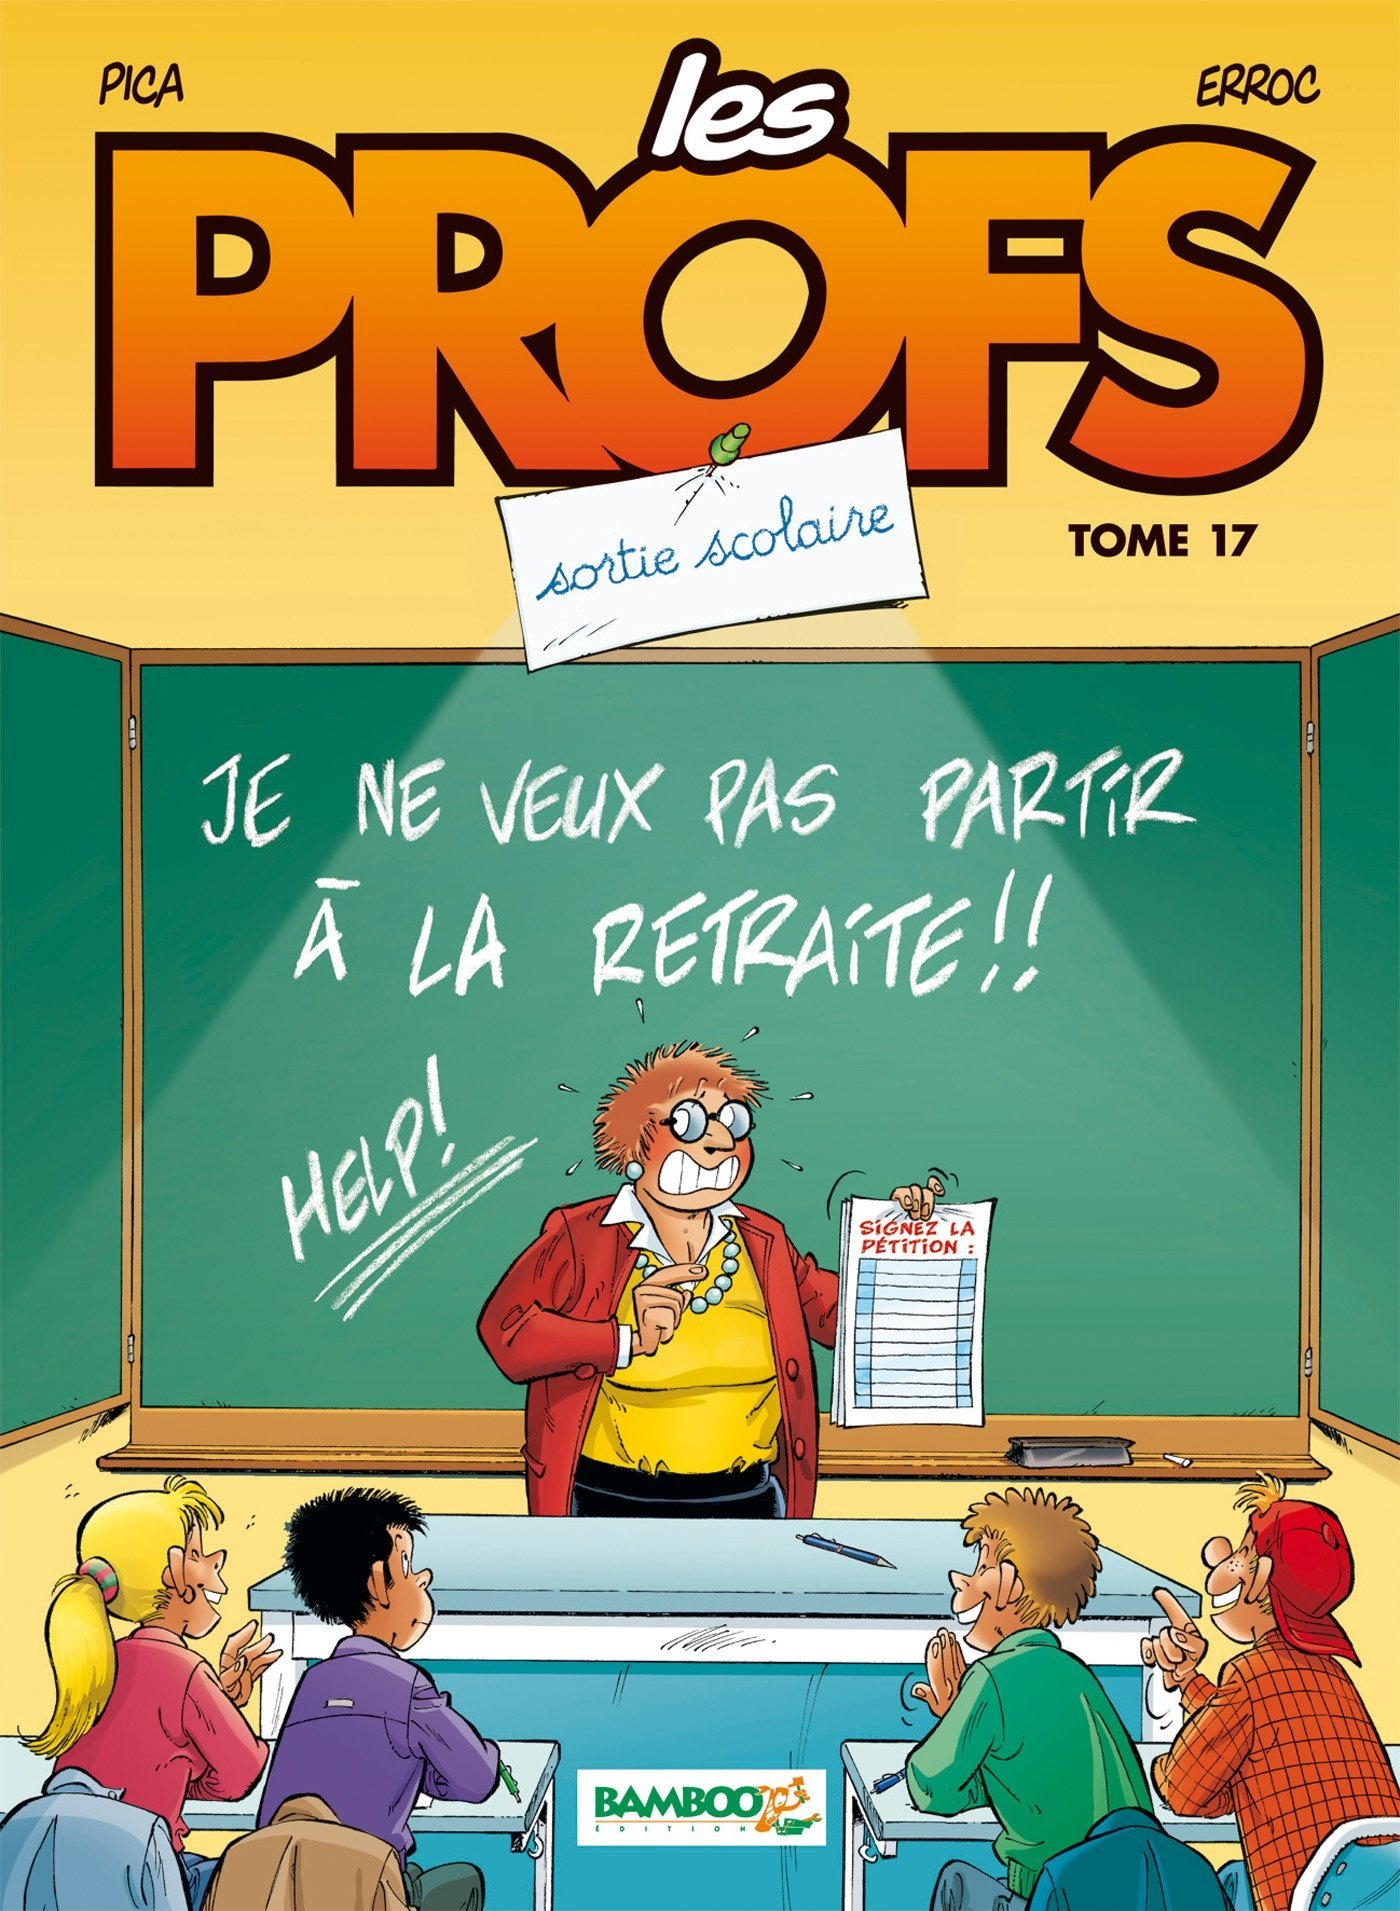 Les Profs - Tome 17 : Sortie scolaire